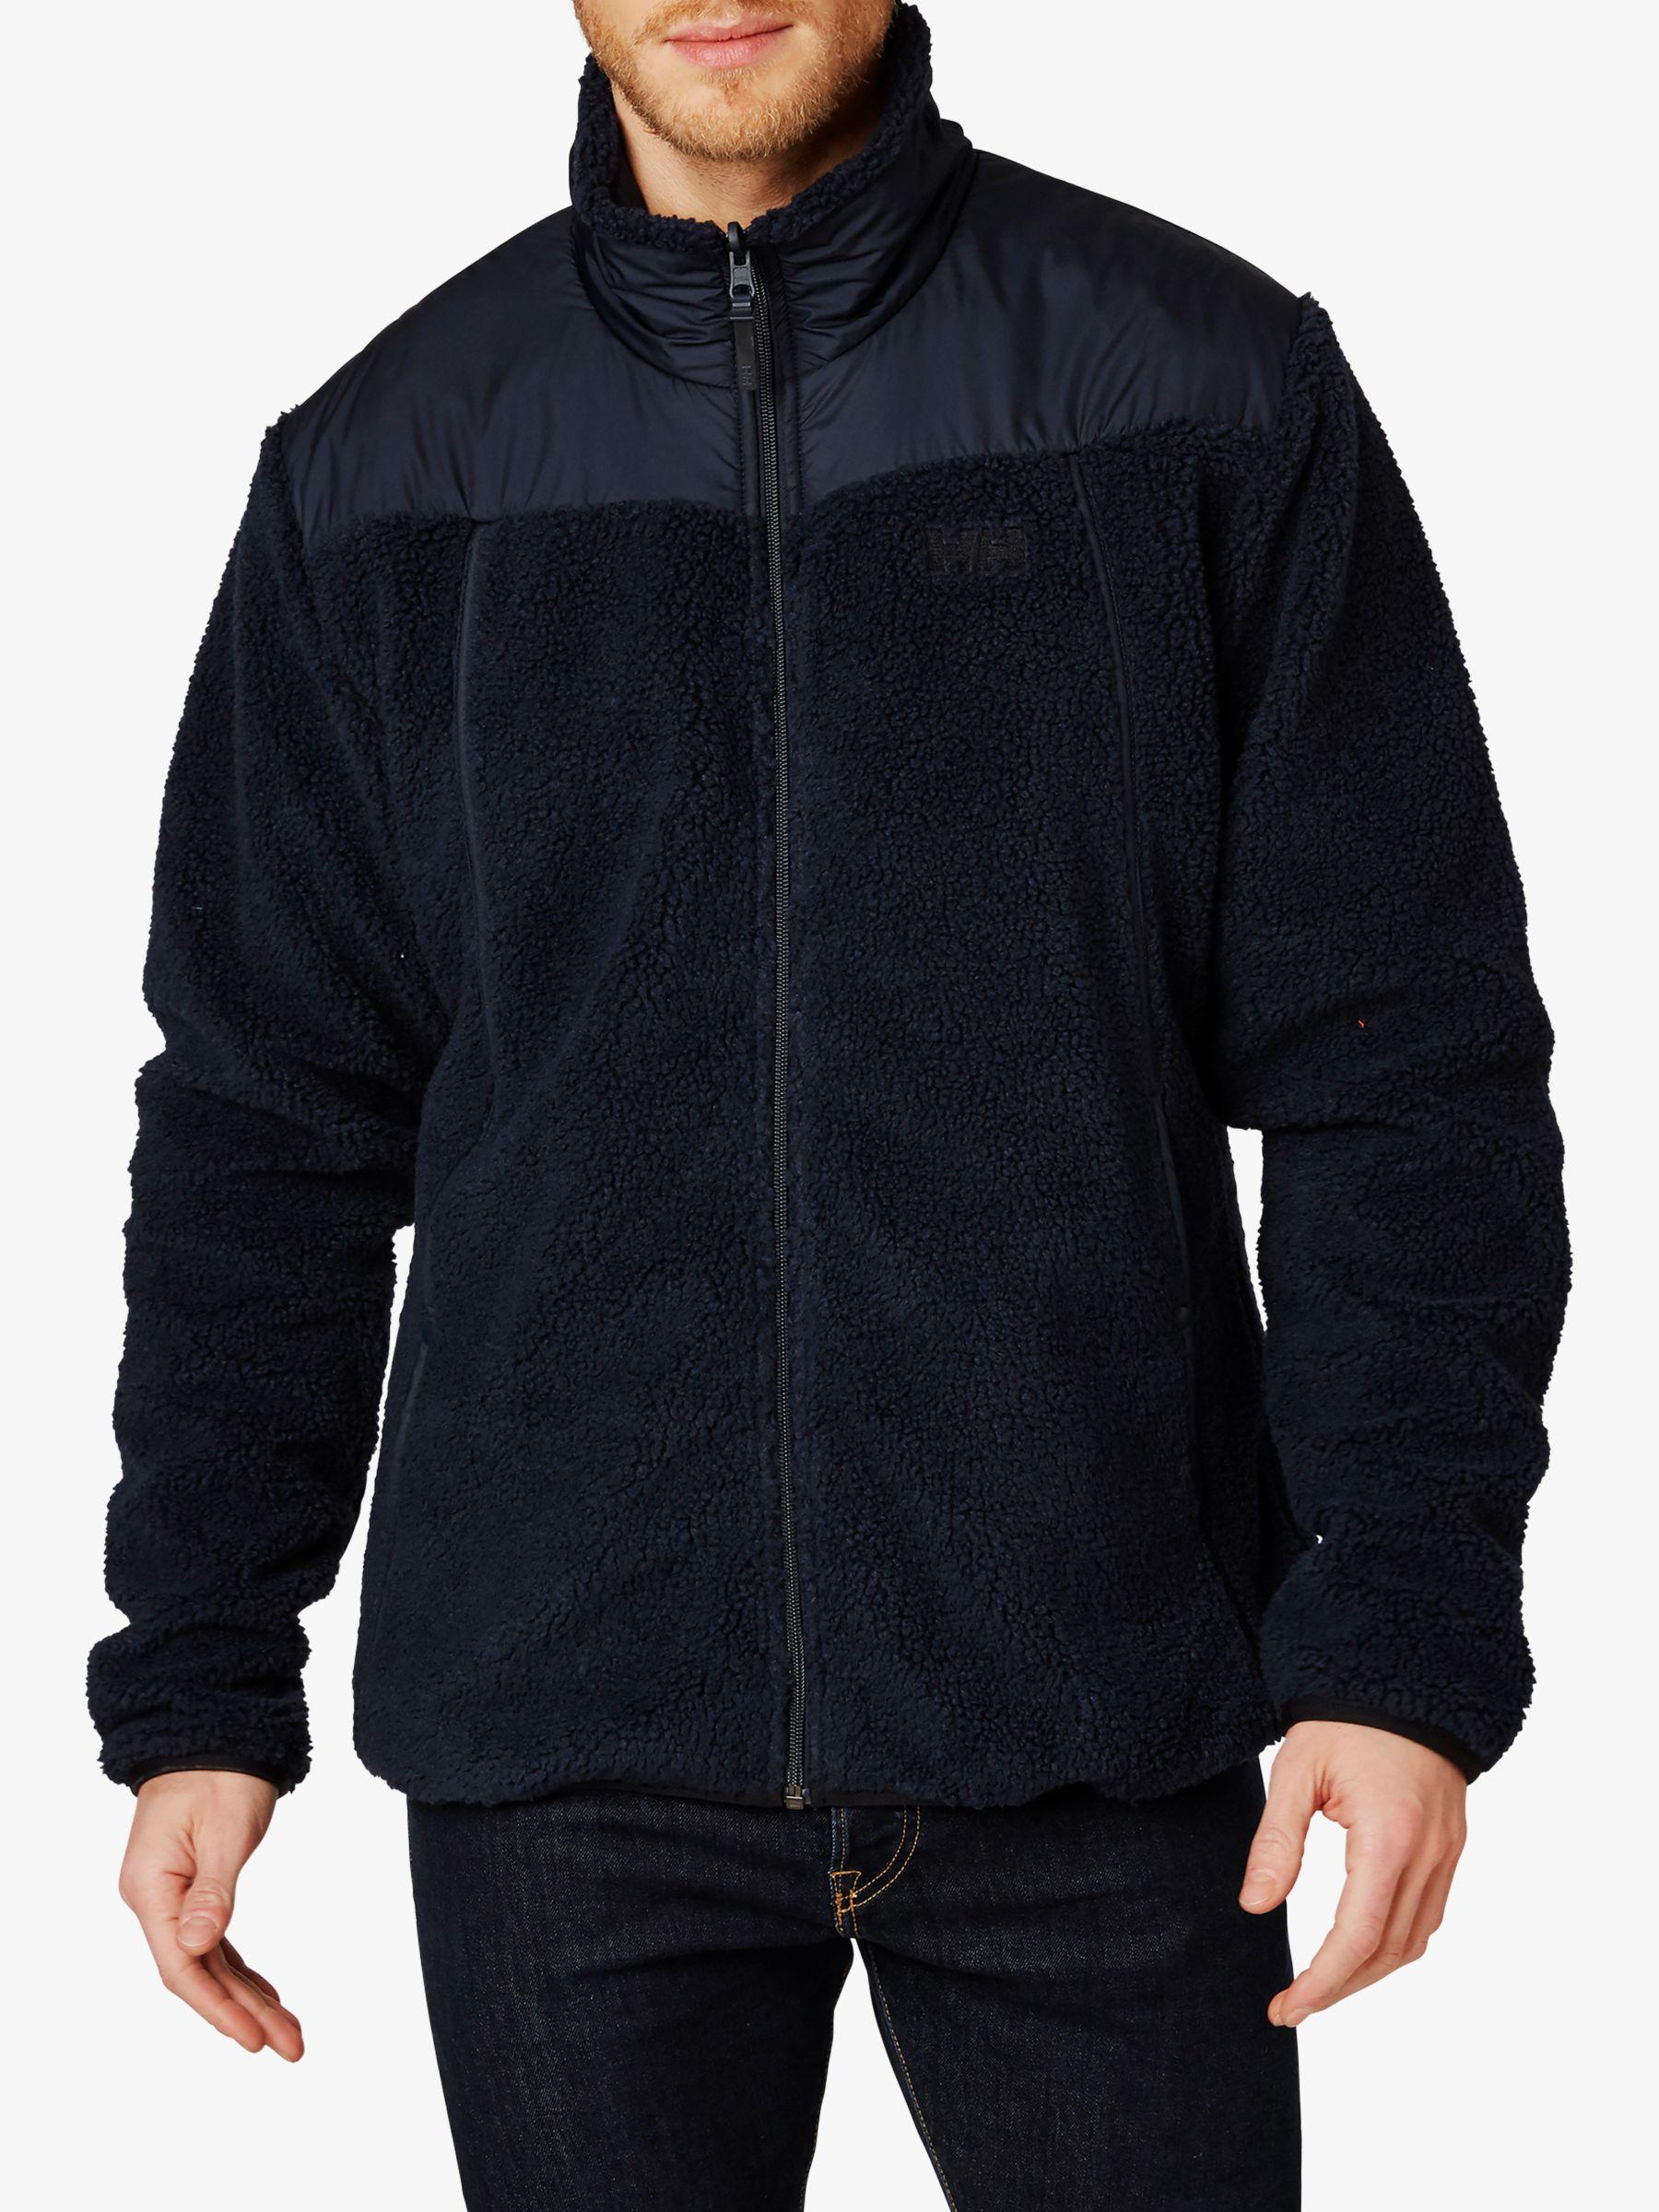 Helly Hansen Helly Hansen Oslo Reversible Pile Full-Zip Fleece Jacket, Navy